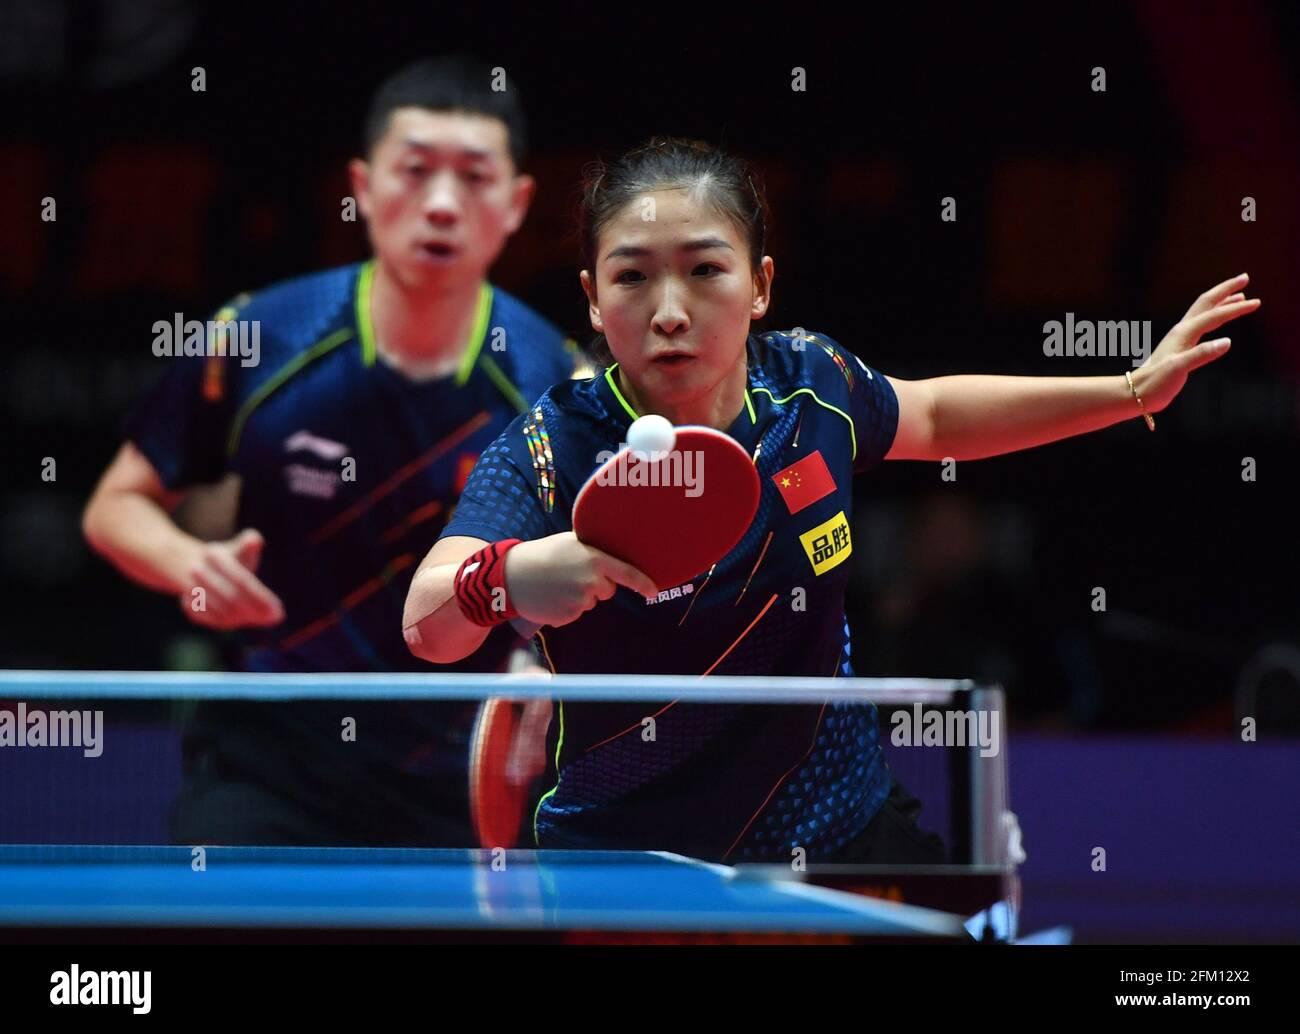 Xinxiang, province chinoise du Henan. 5 mai 2021. Xu Xin (L)/Liu Shiwen en compétition pendant le quart de finale mixte de doubles entre Xu Xin/Liu Shiwen et Zhou Yu/Chen Xingtong lors des essais de Grand smashes de WTT (World Table tennis) de 2021 et de la simulation olympique à Xinxiang, dans la province de Henan, au centre de la Chine, le 5 mai 2021. Credit: Li Jianan/Xinhua/Alamy Live News Banque D'Images